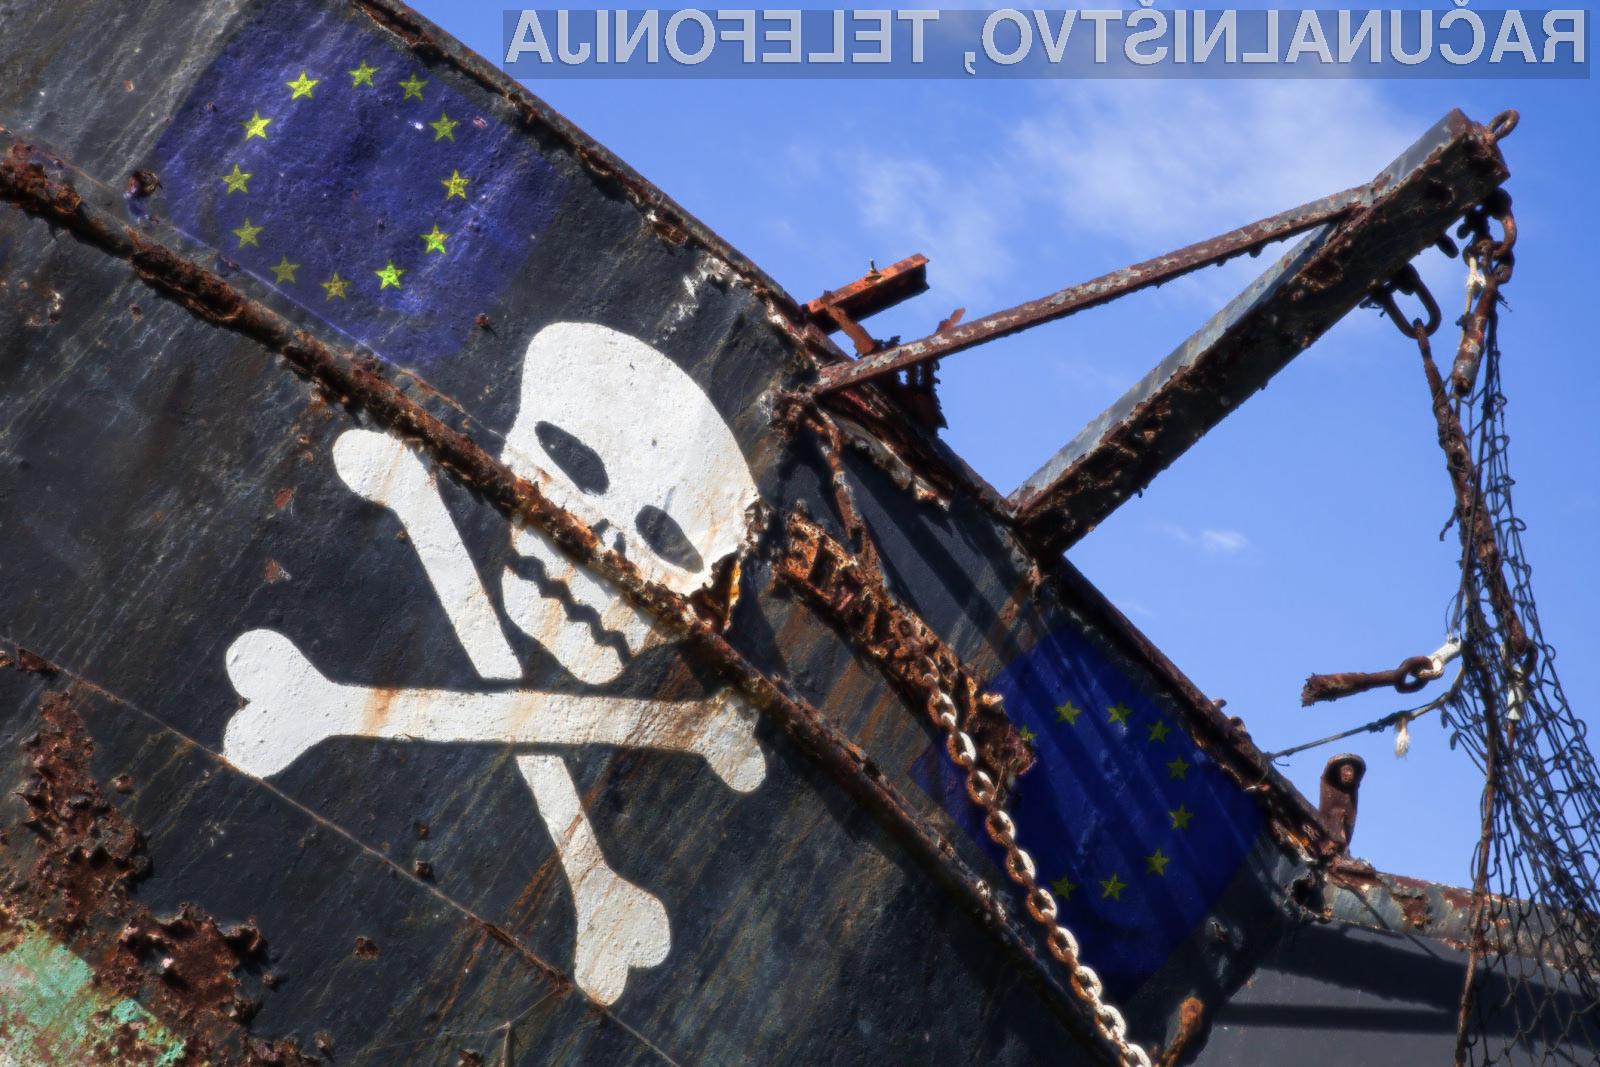 Evropska komisija naj bi imela dokaze o tem, da piratstvo ni škodljivo!